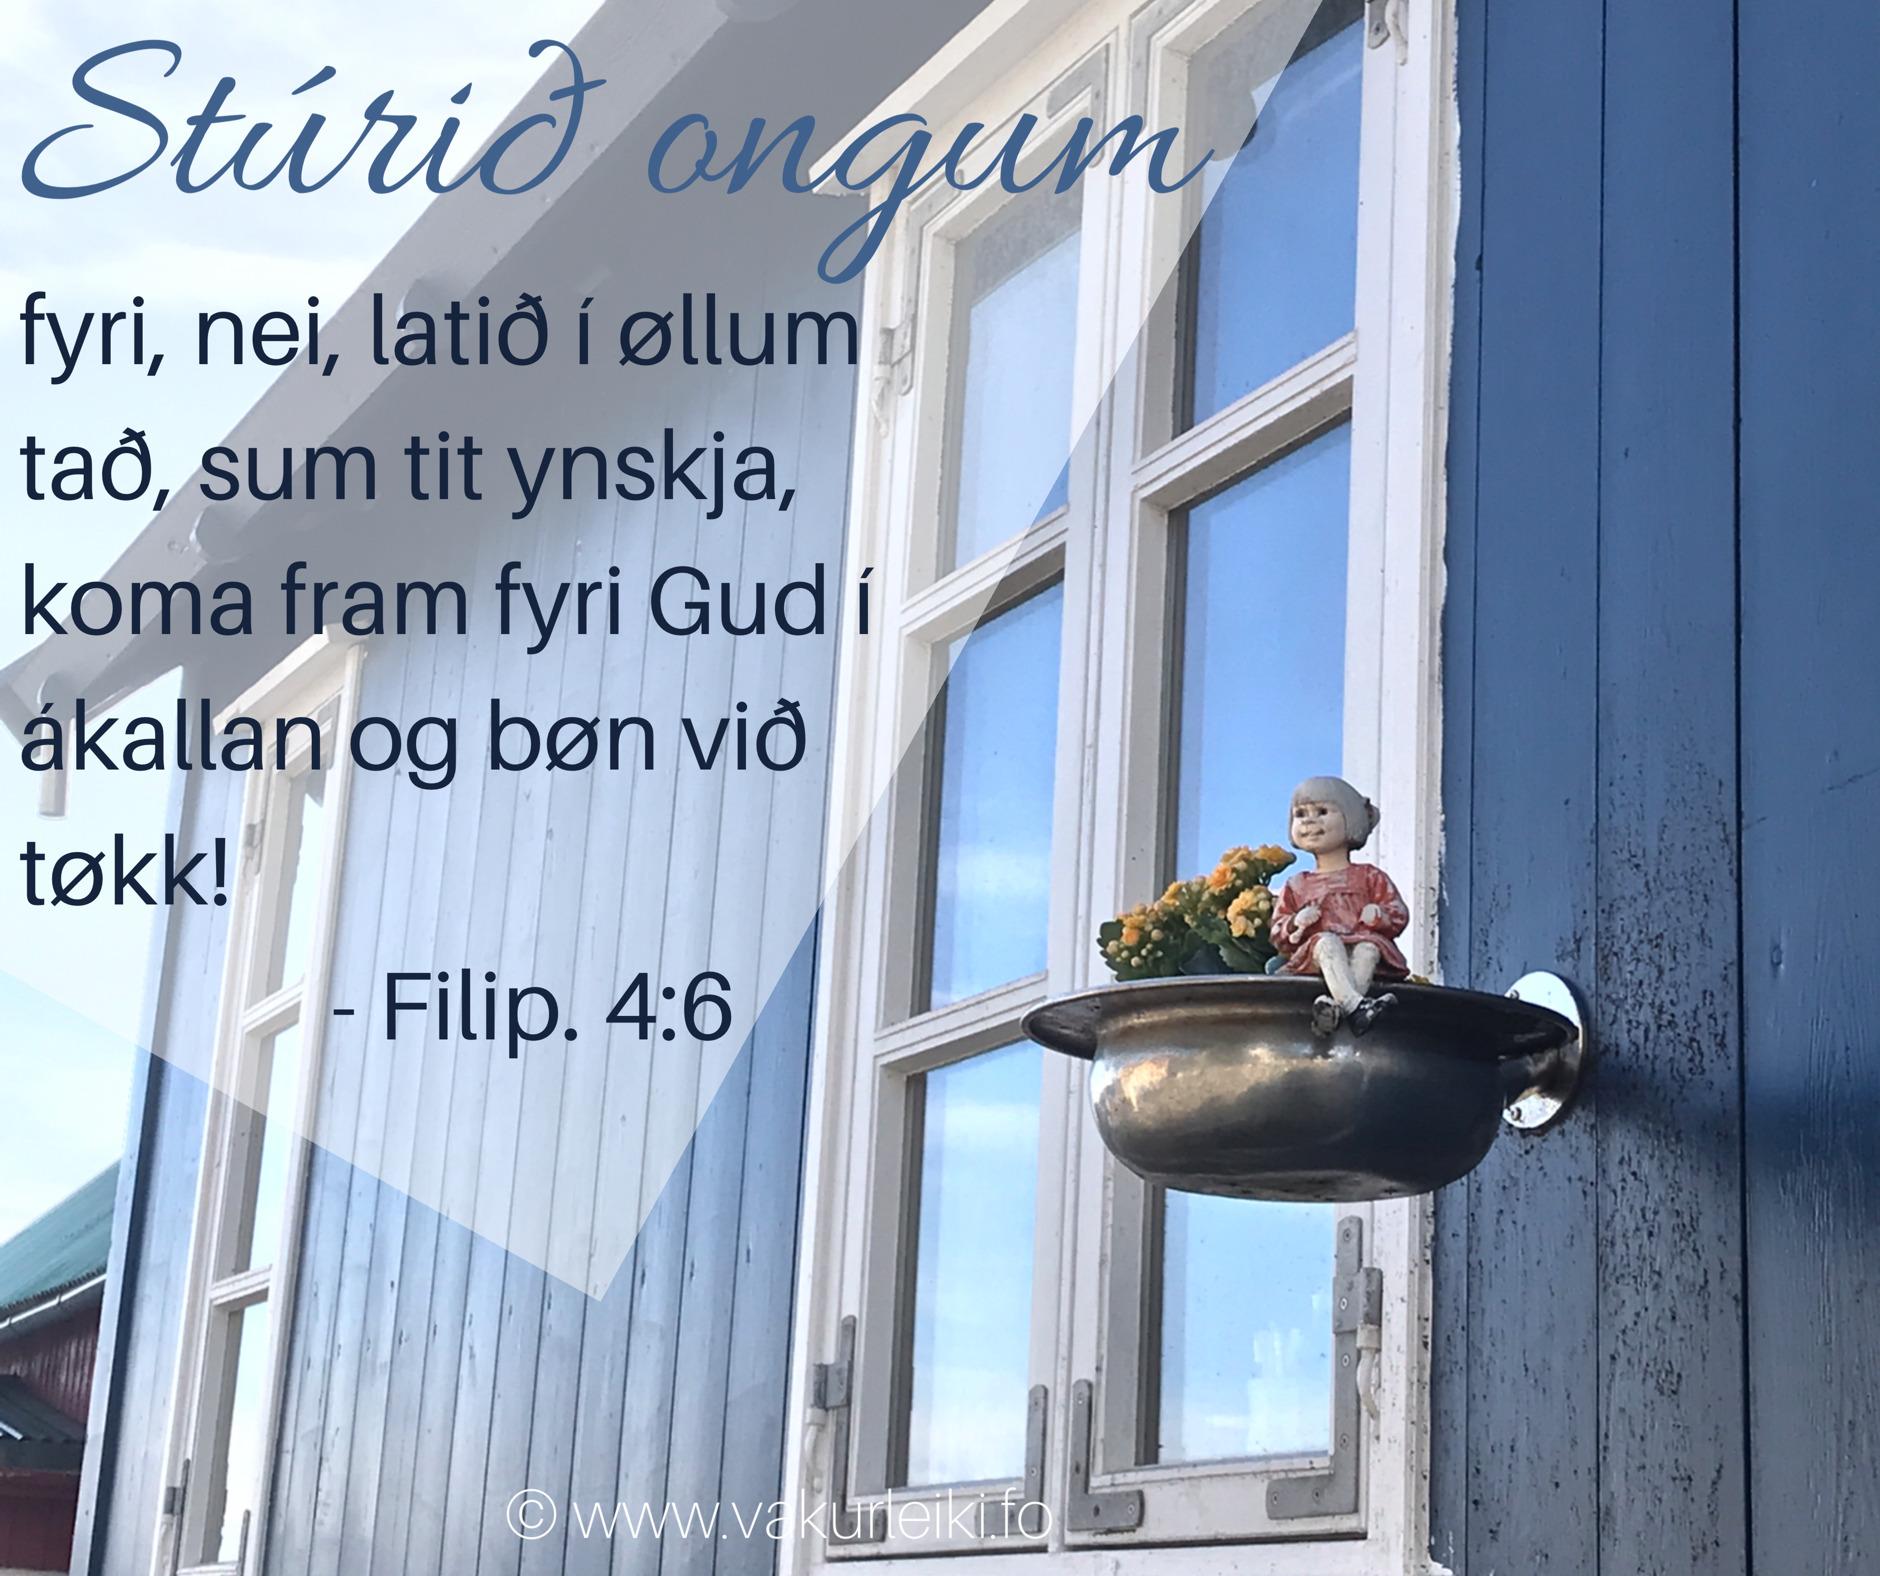 Filip. 4:6